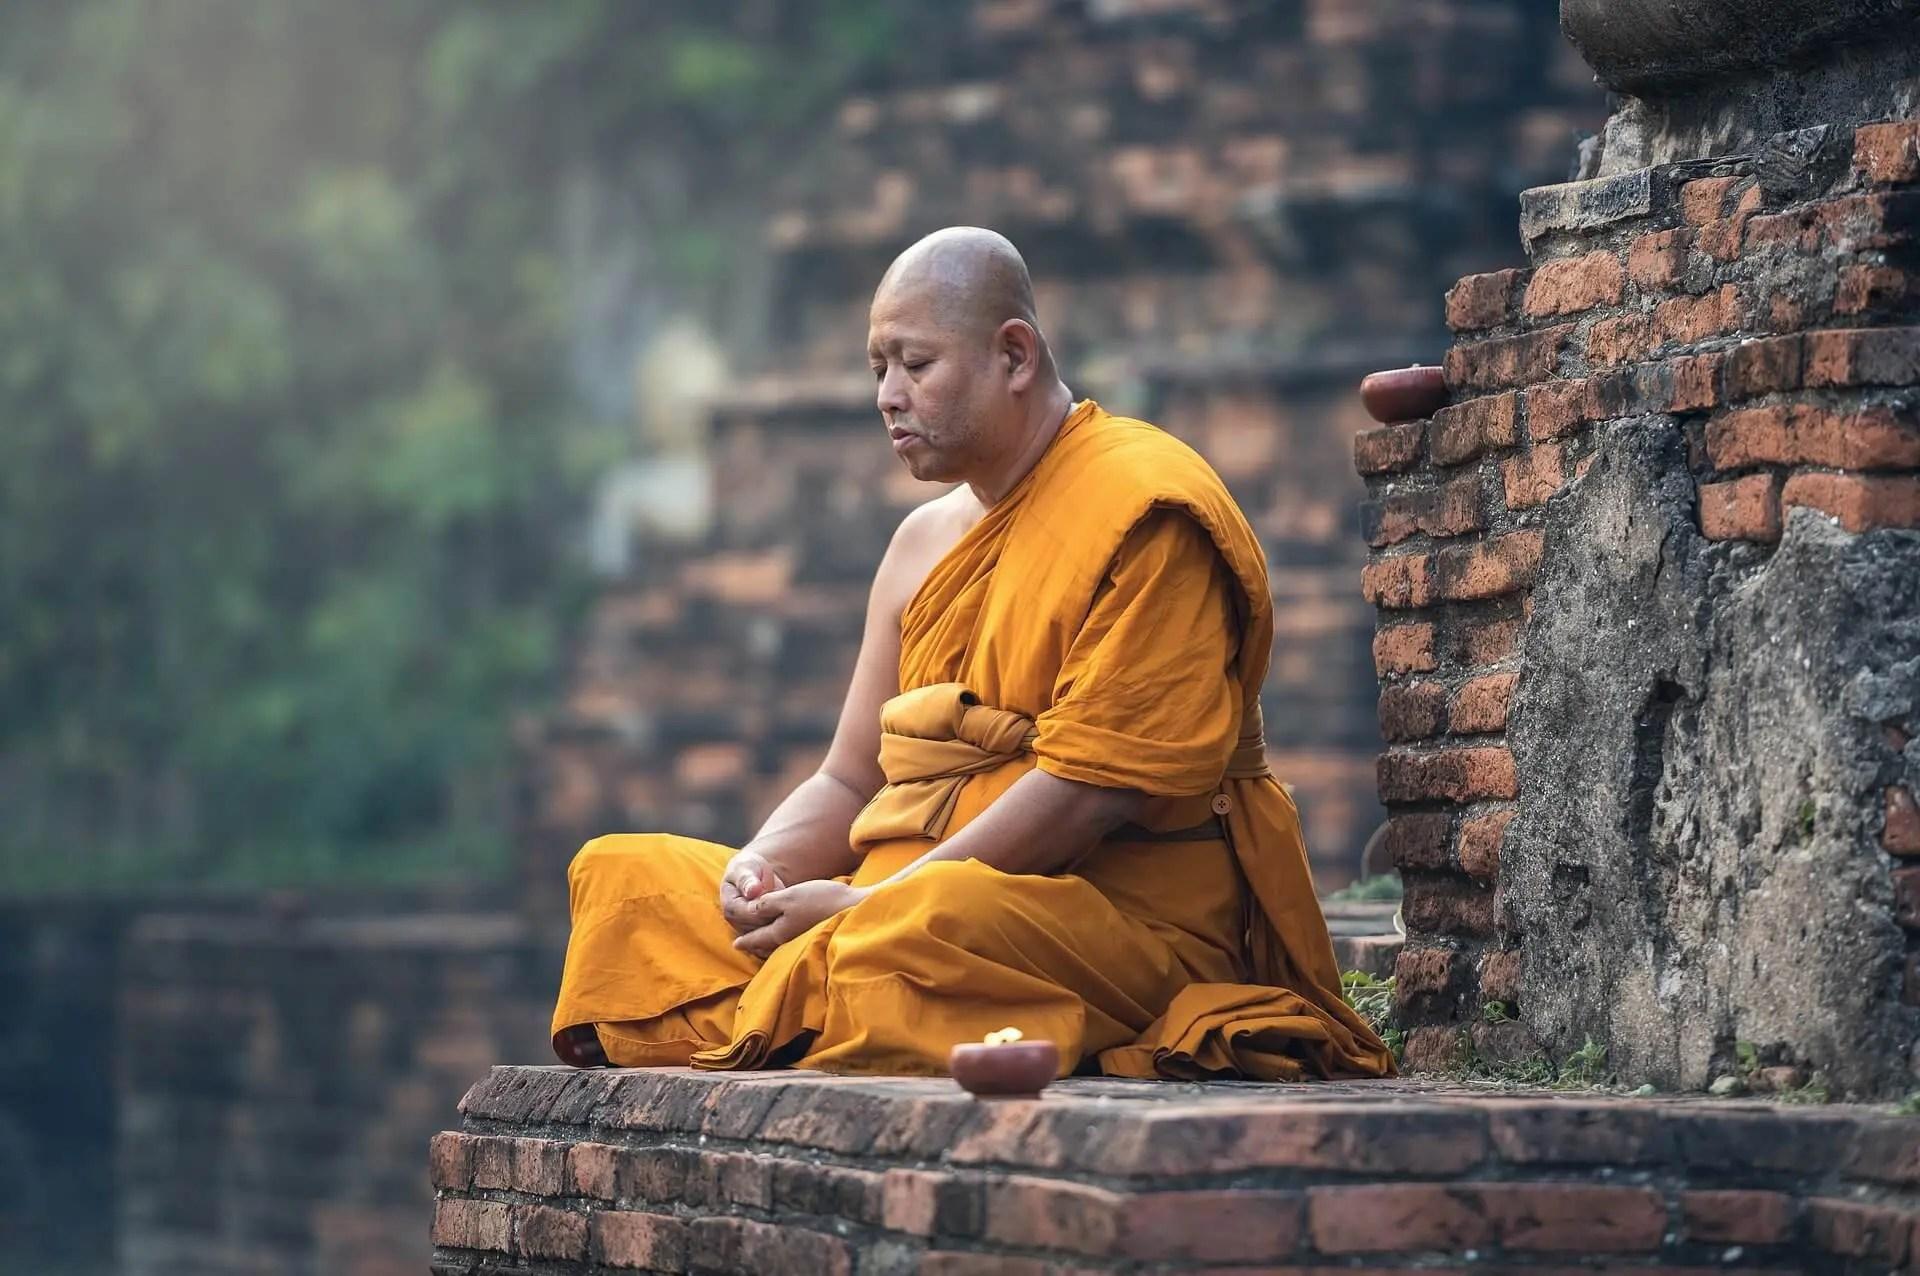 Types of meditation - Spiritual meditation